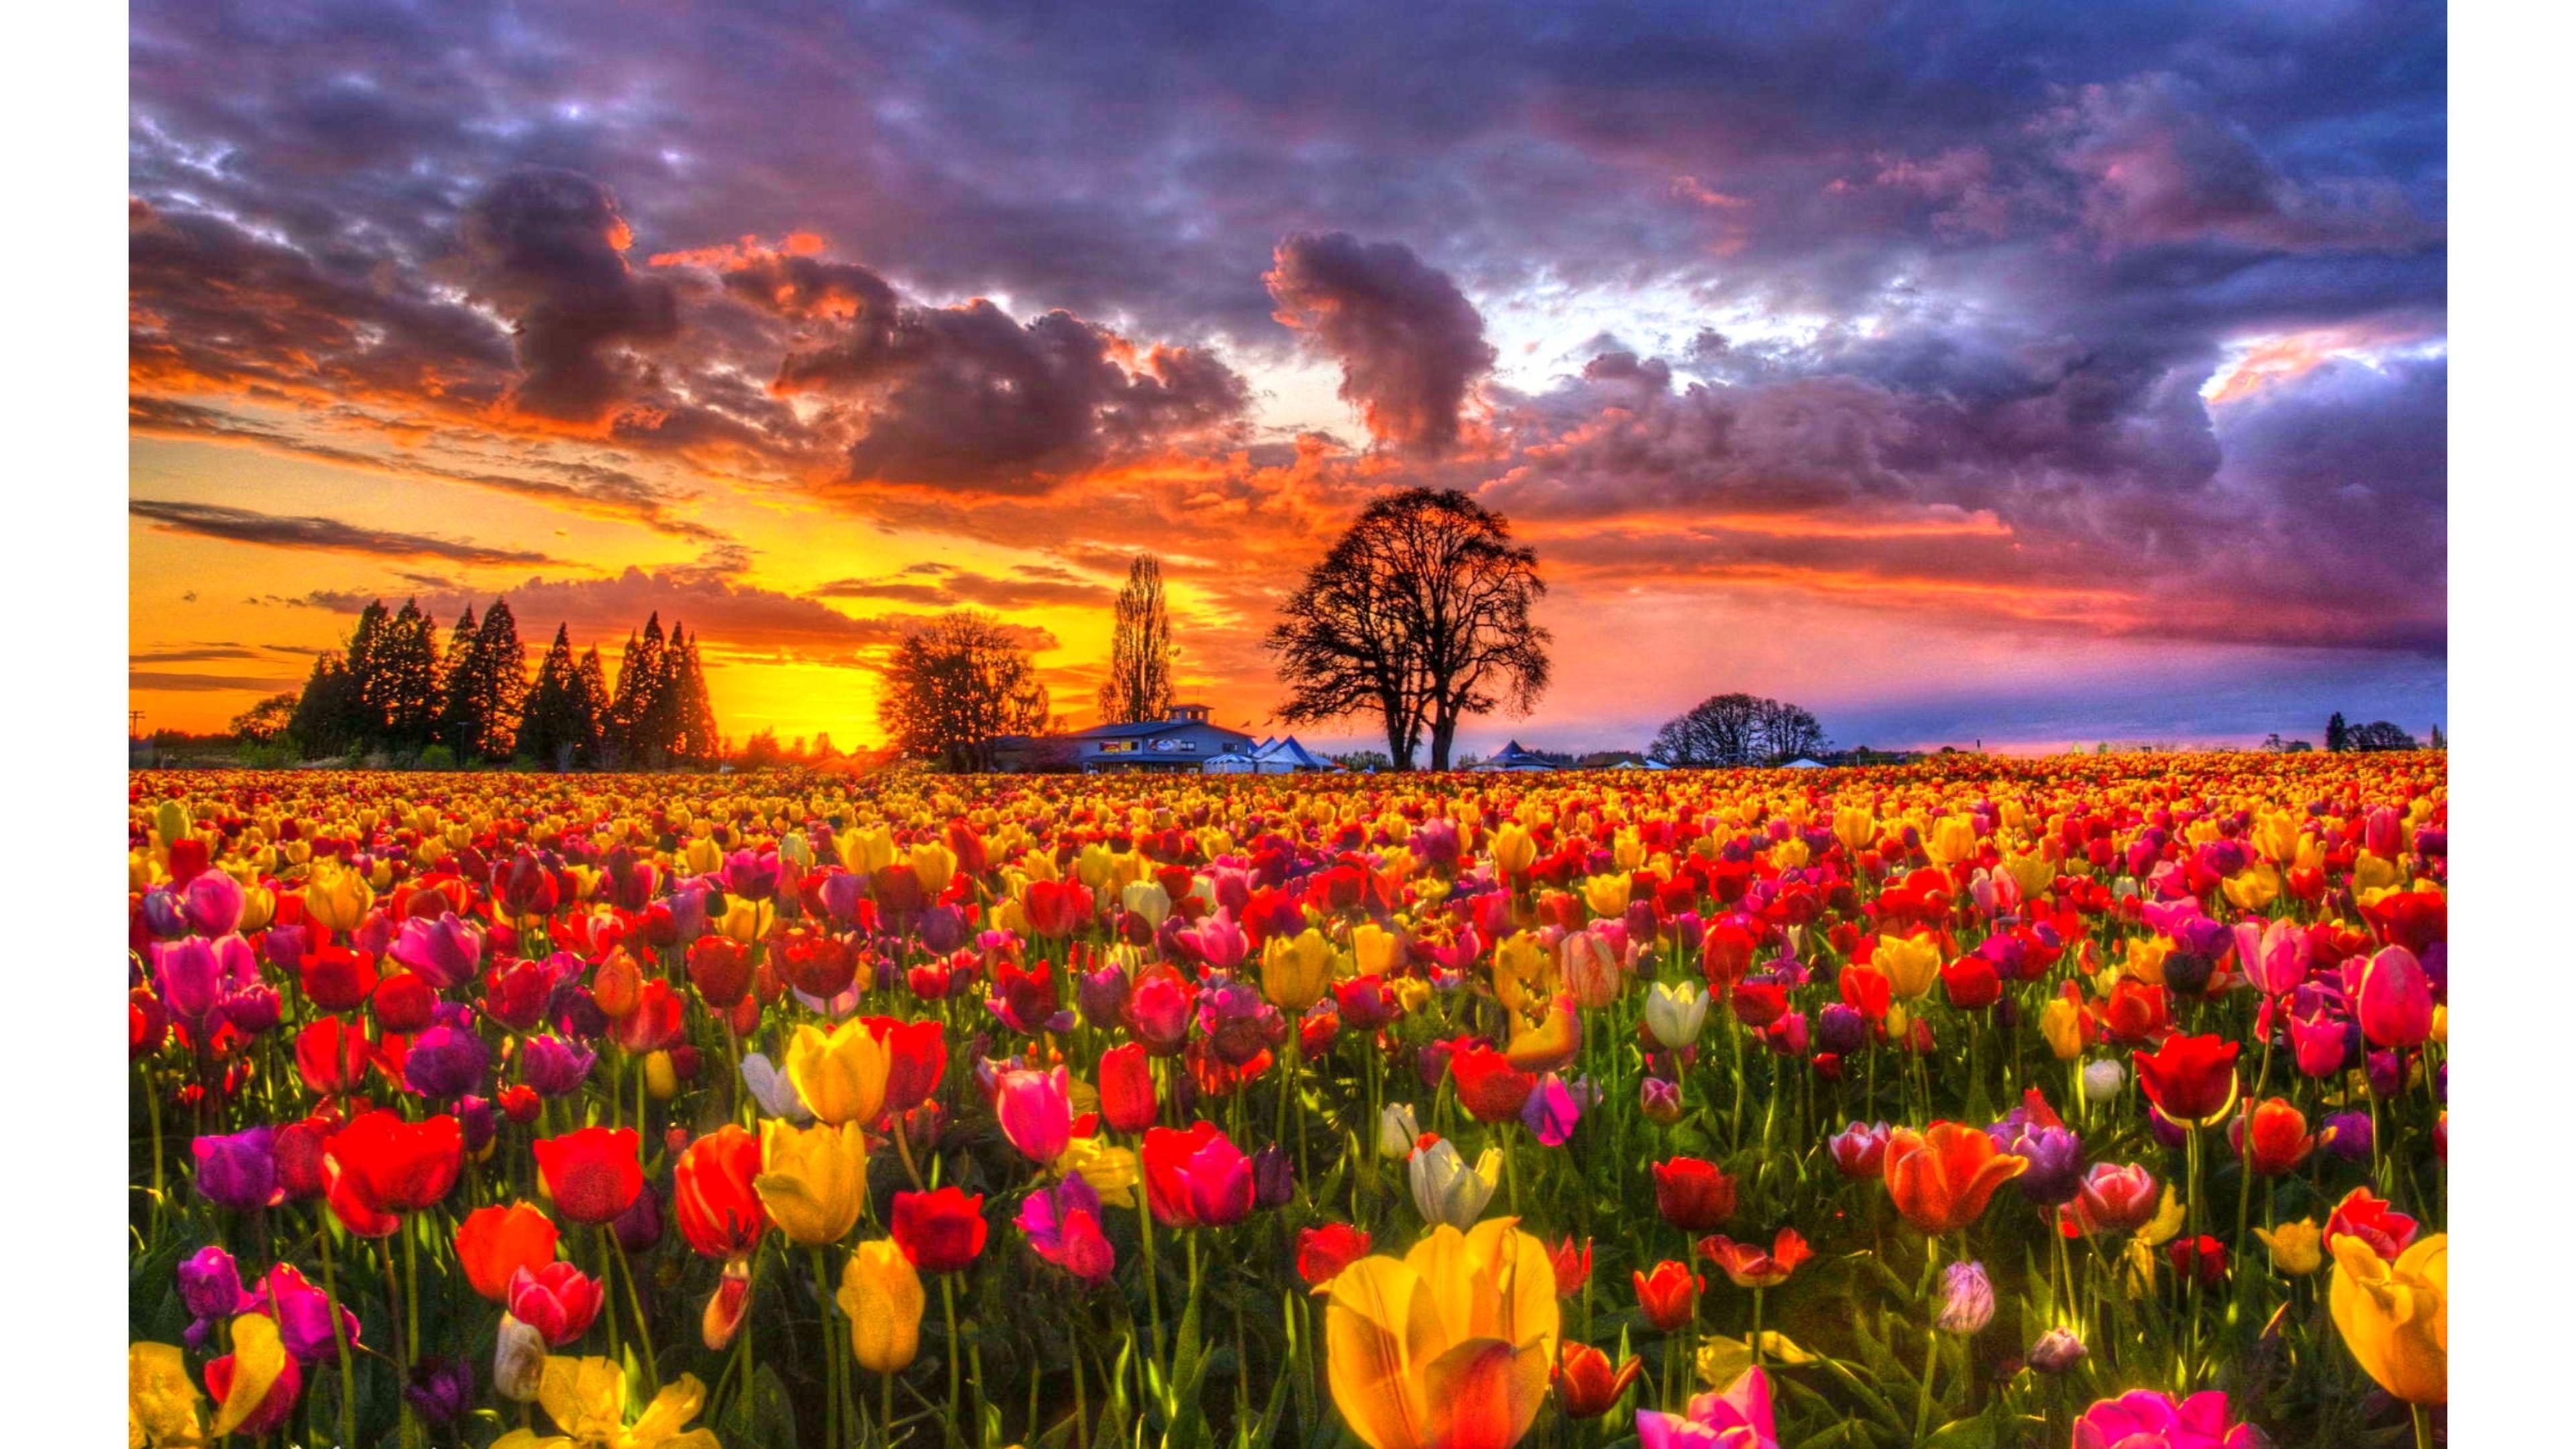 Spring Flowers Tulips Field Sunrise Grass Clouds: Pin De Javier Magdaleno En Paisajes